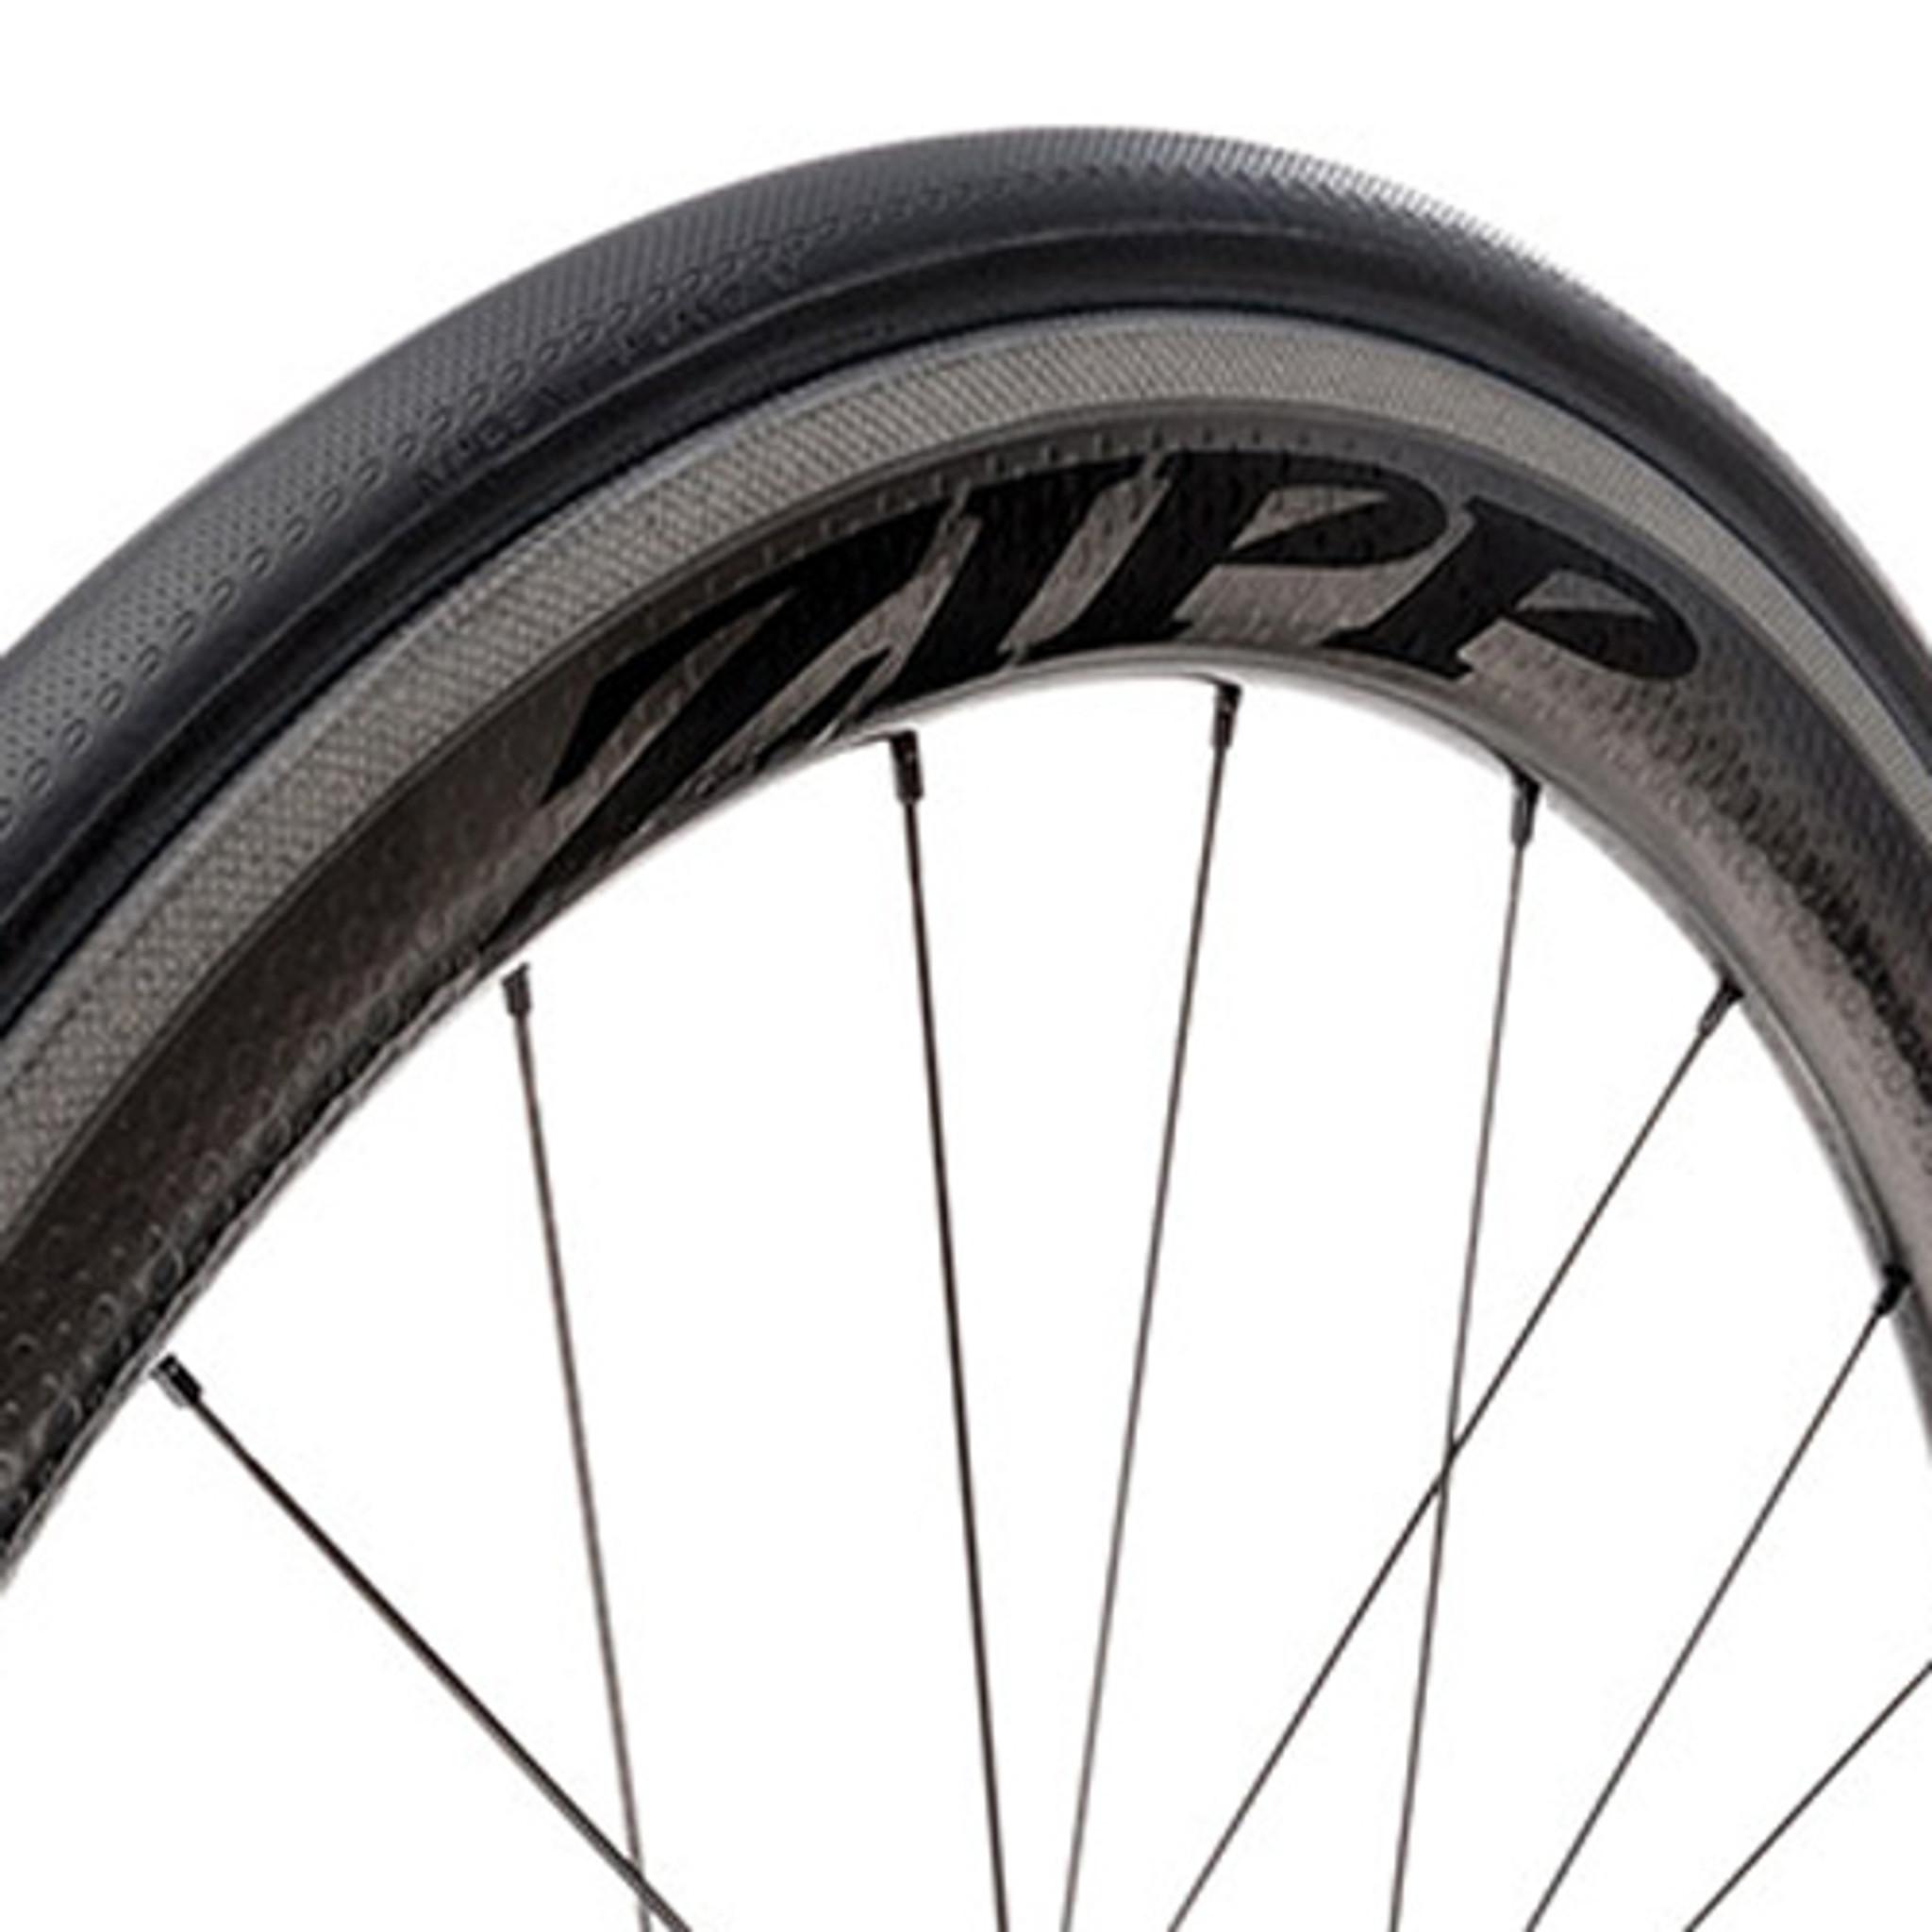 Disc 808 Matte Black Logo Complete for One Wheel Zipp Decal Set